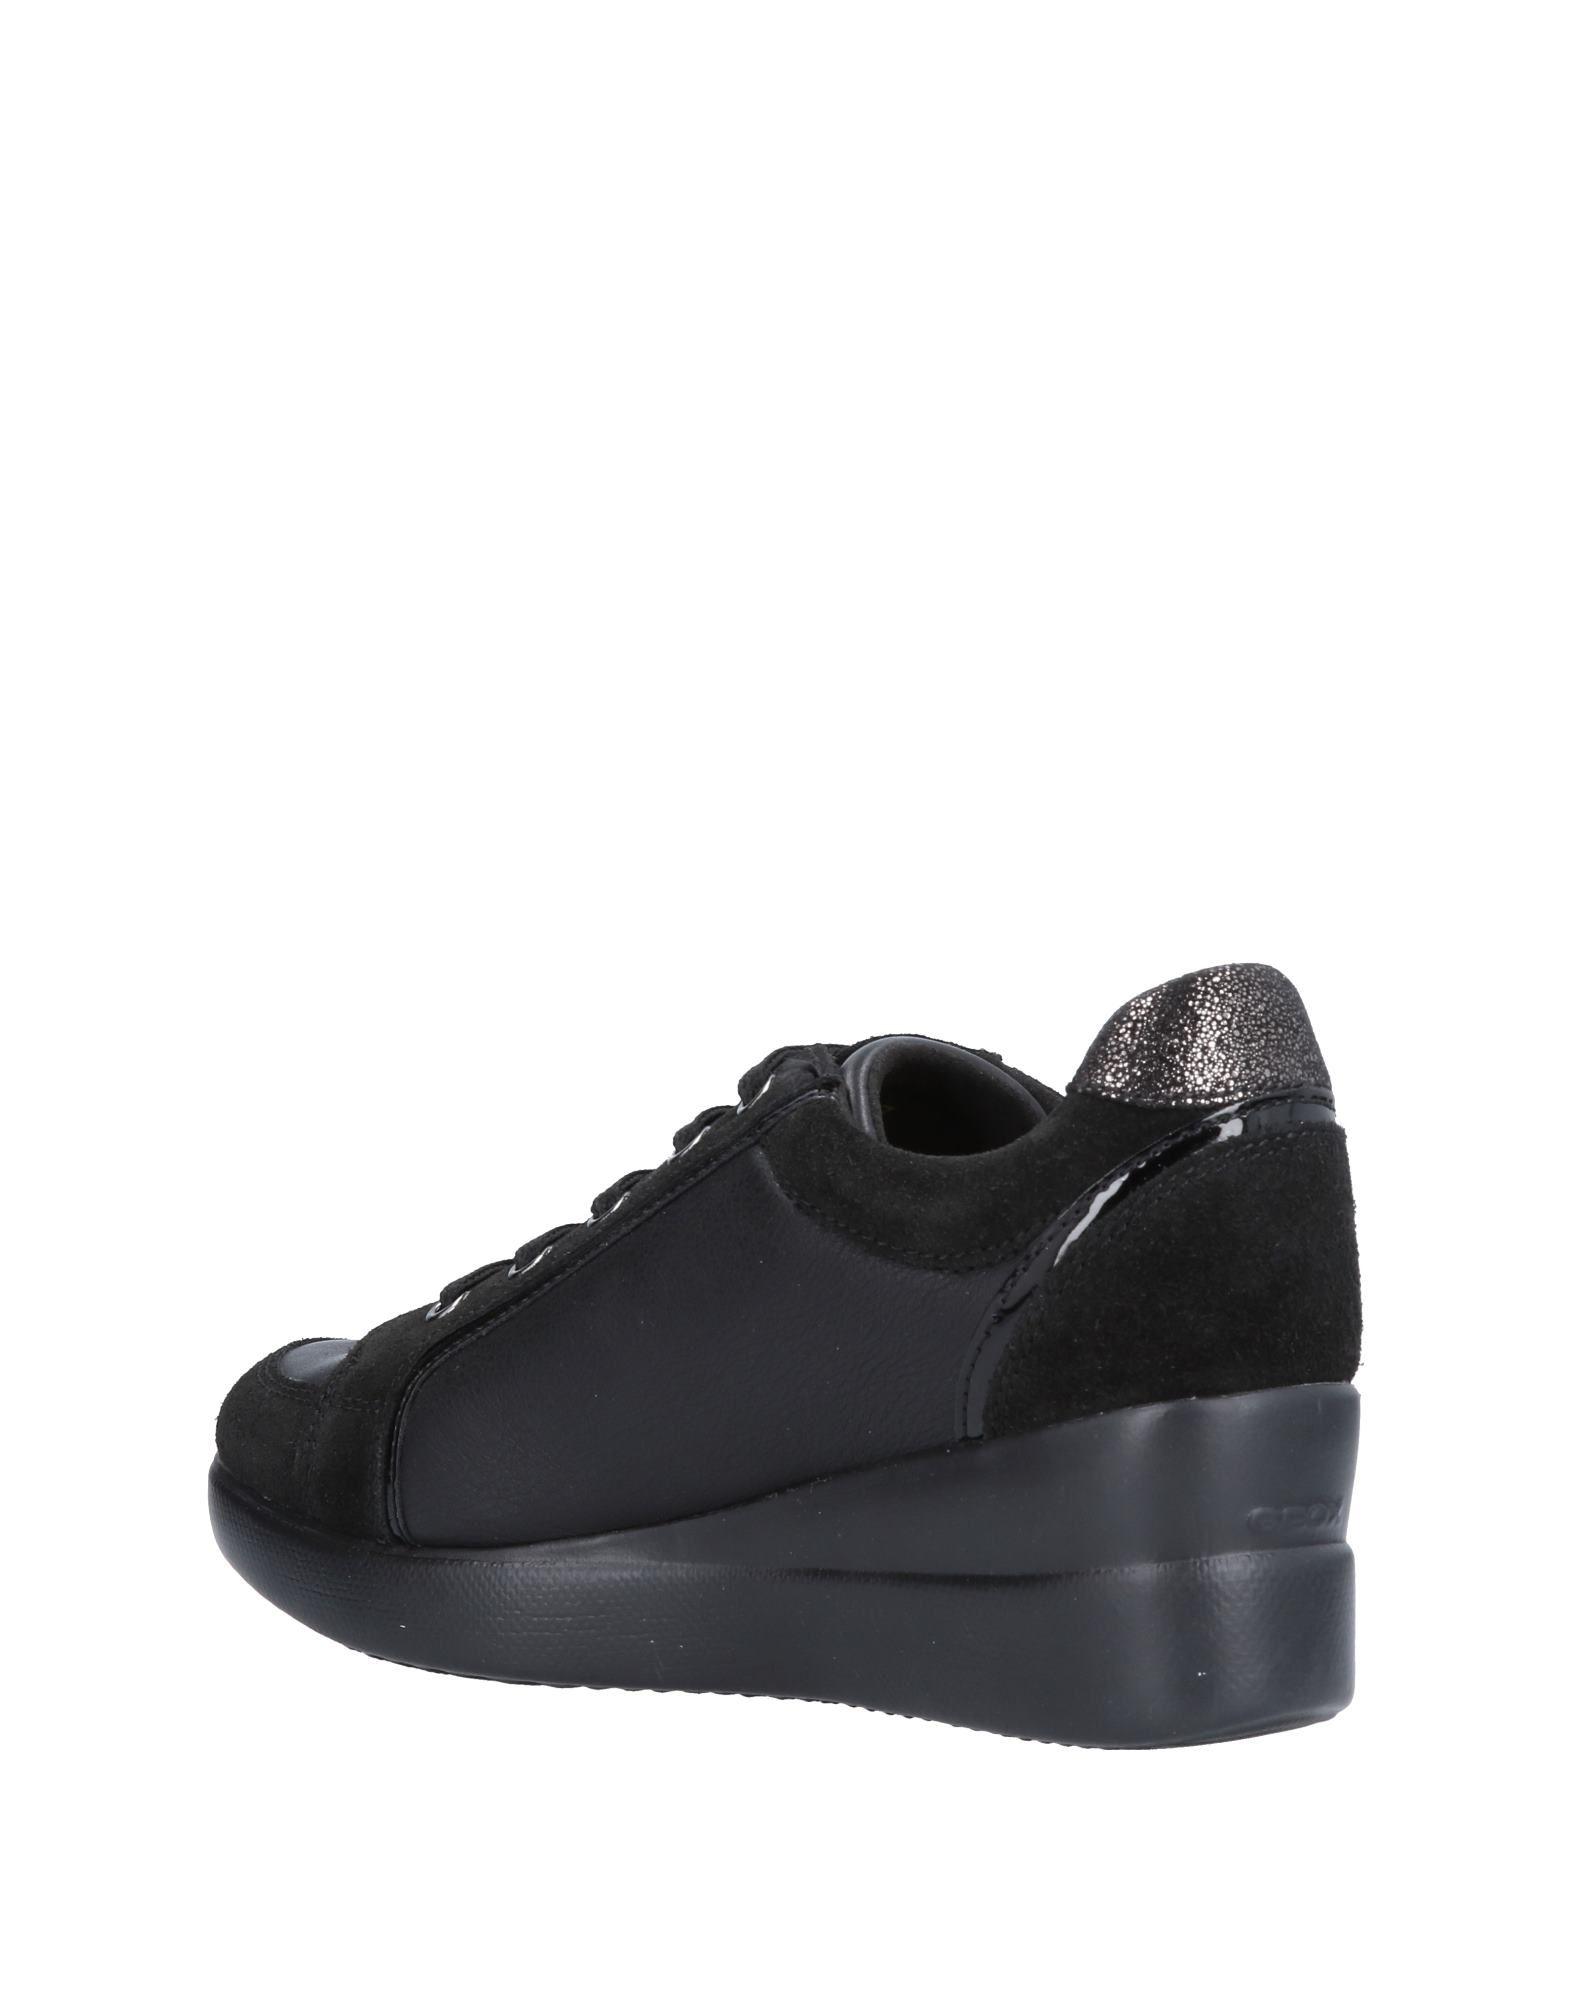 Geox Sneakers Damen  11496886CX Gute Qualität beliebte Schuhe